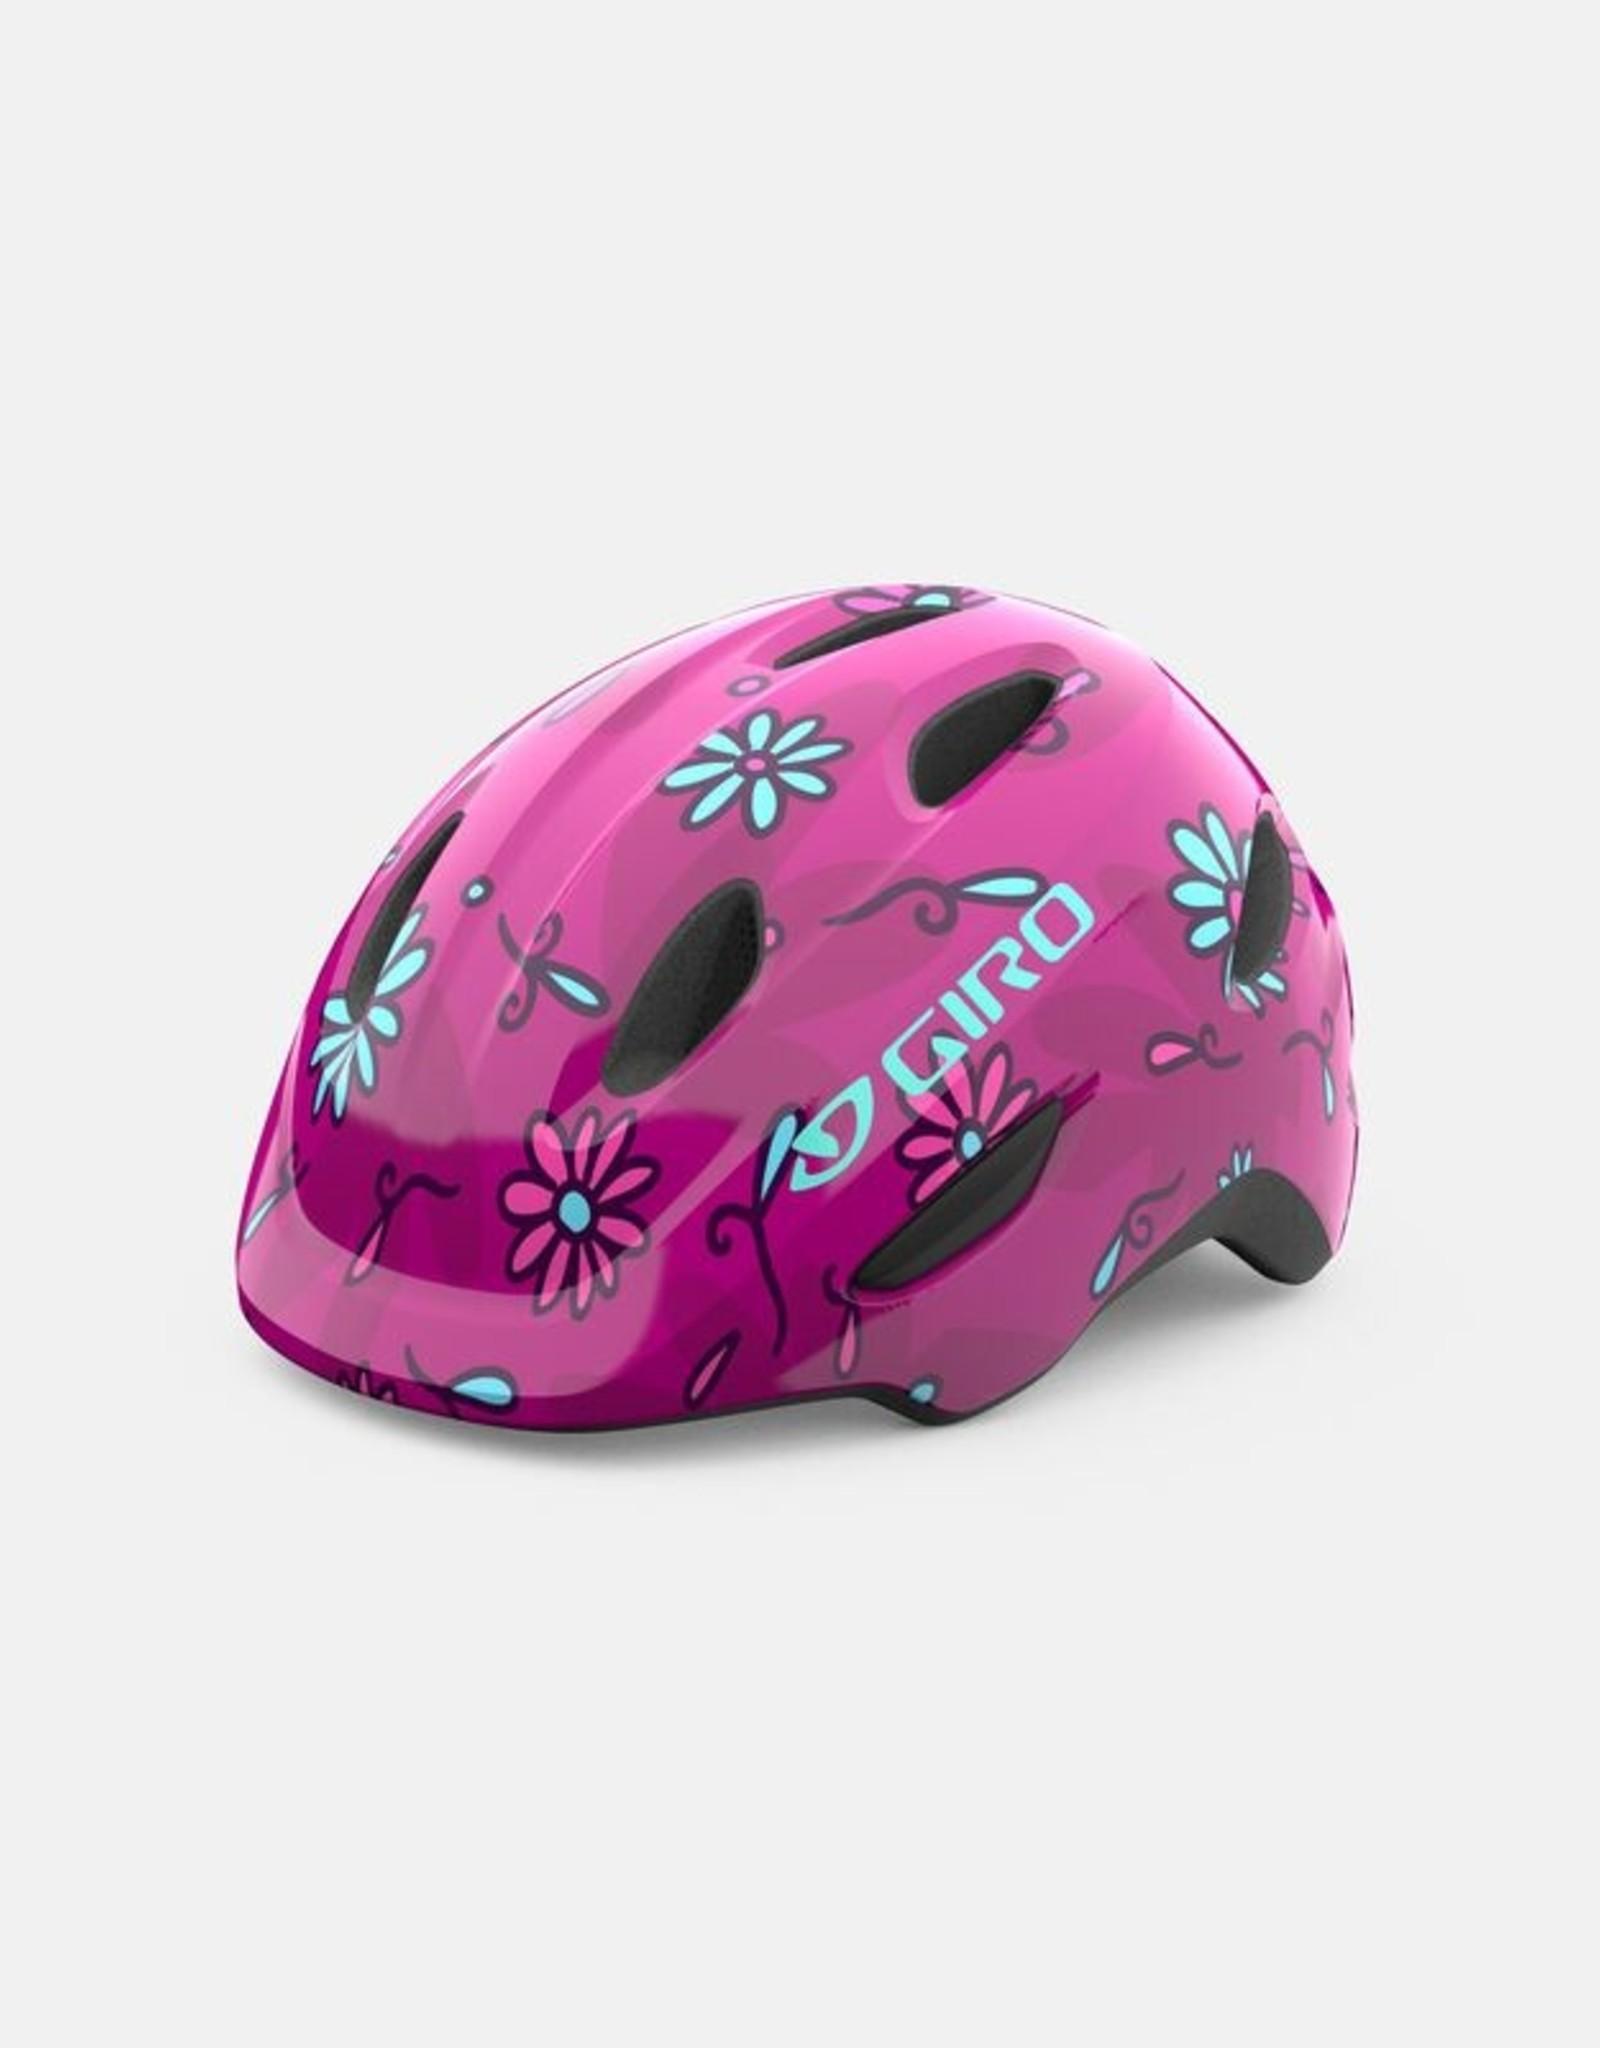 Giro Giro Scamp MIPS Kids Bike Helmet